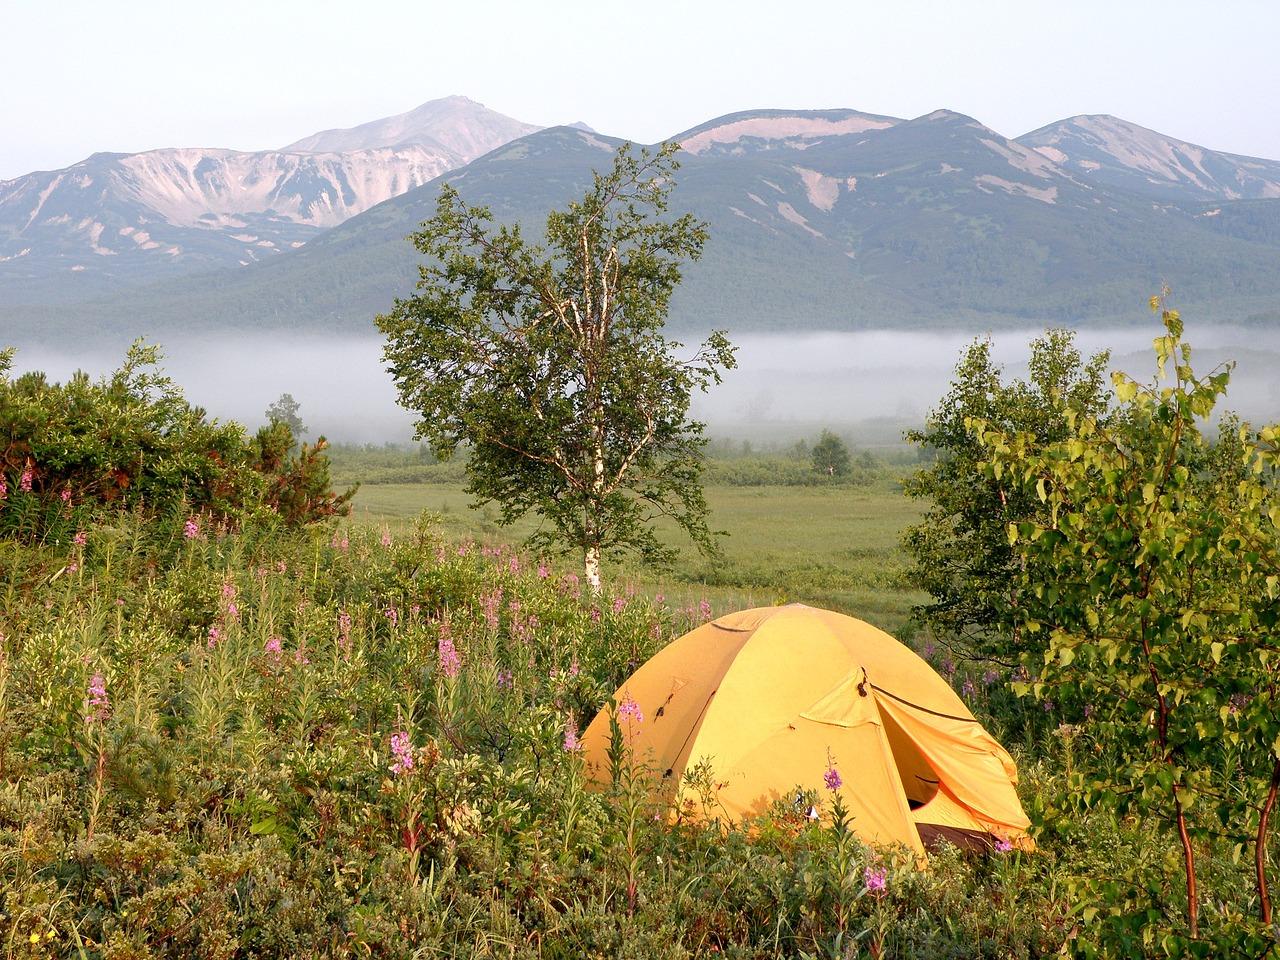 Tent Peg Pulls